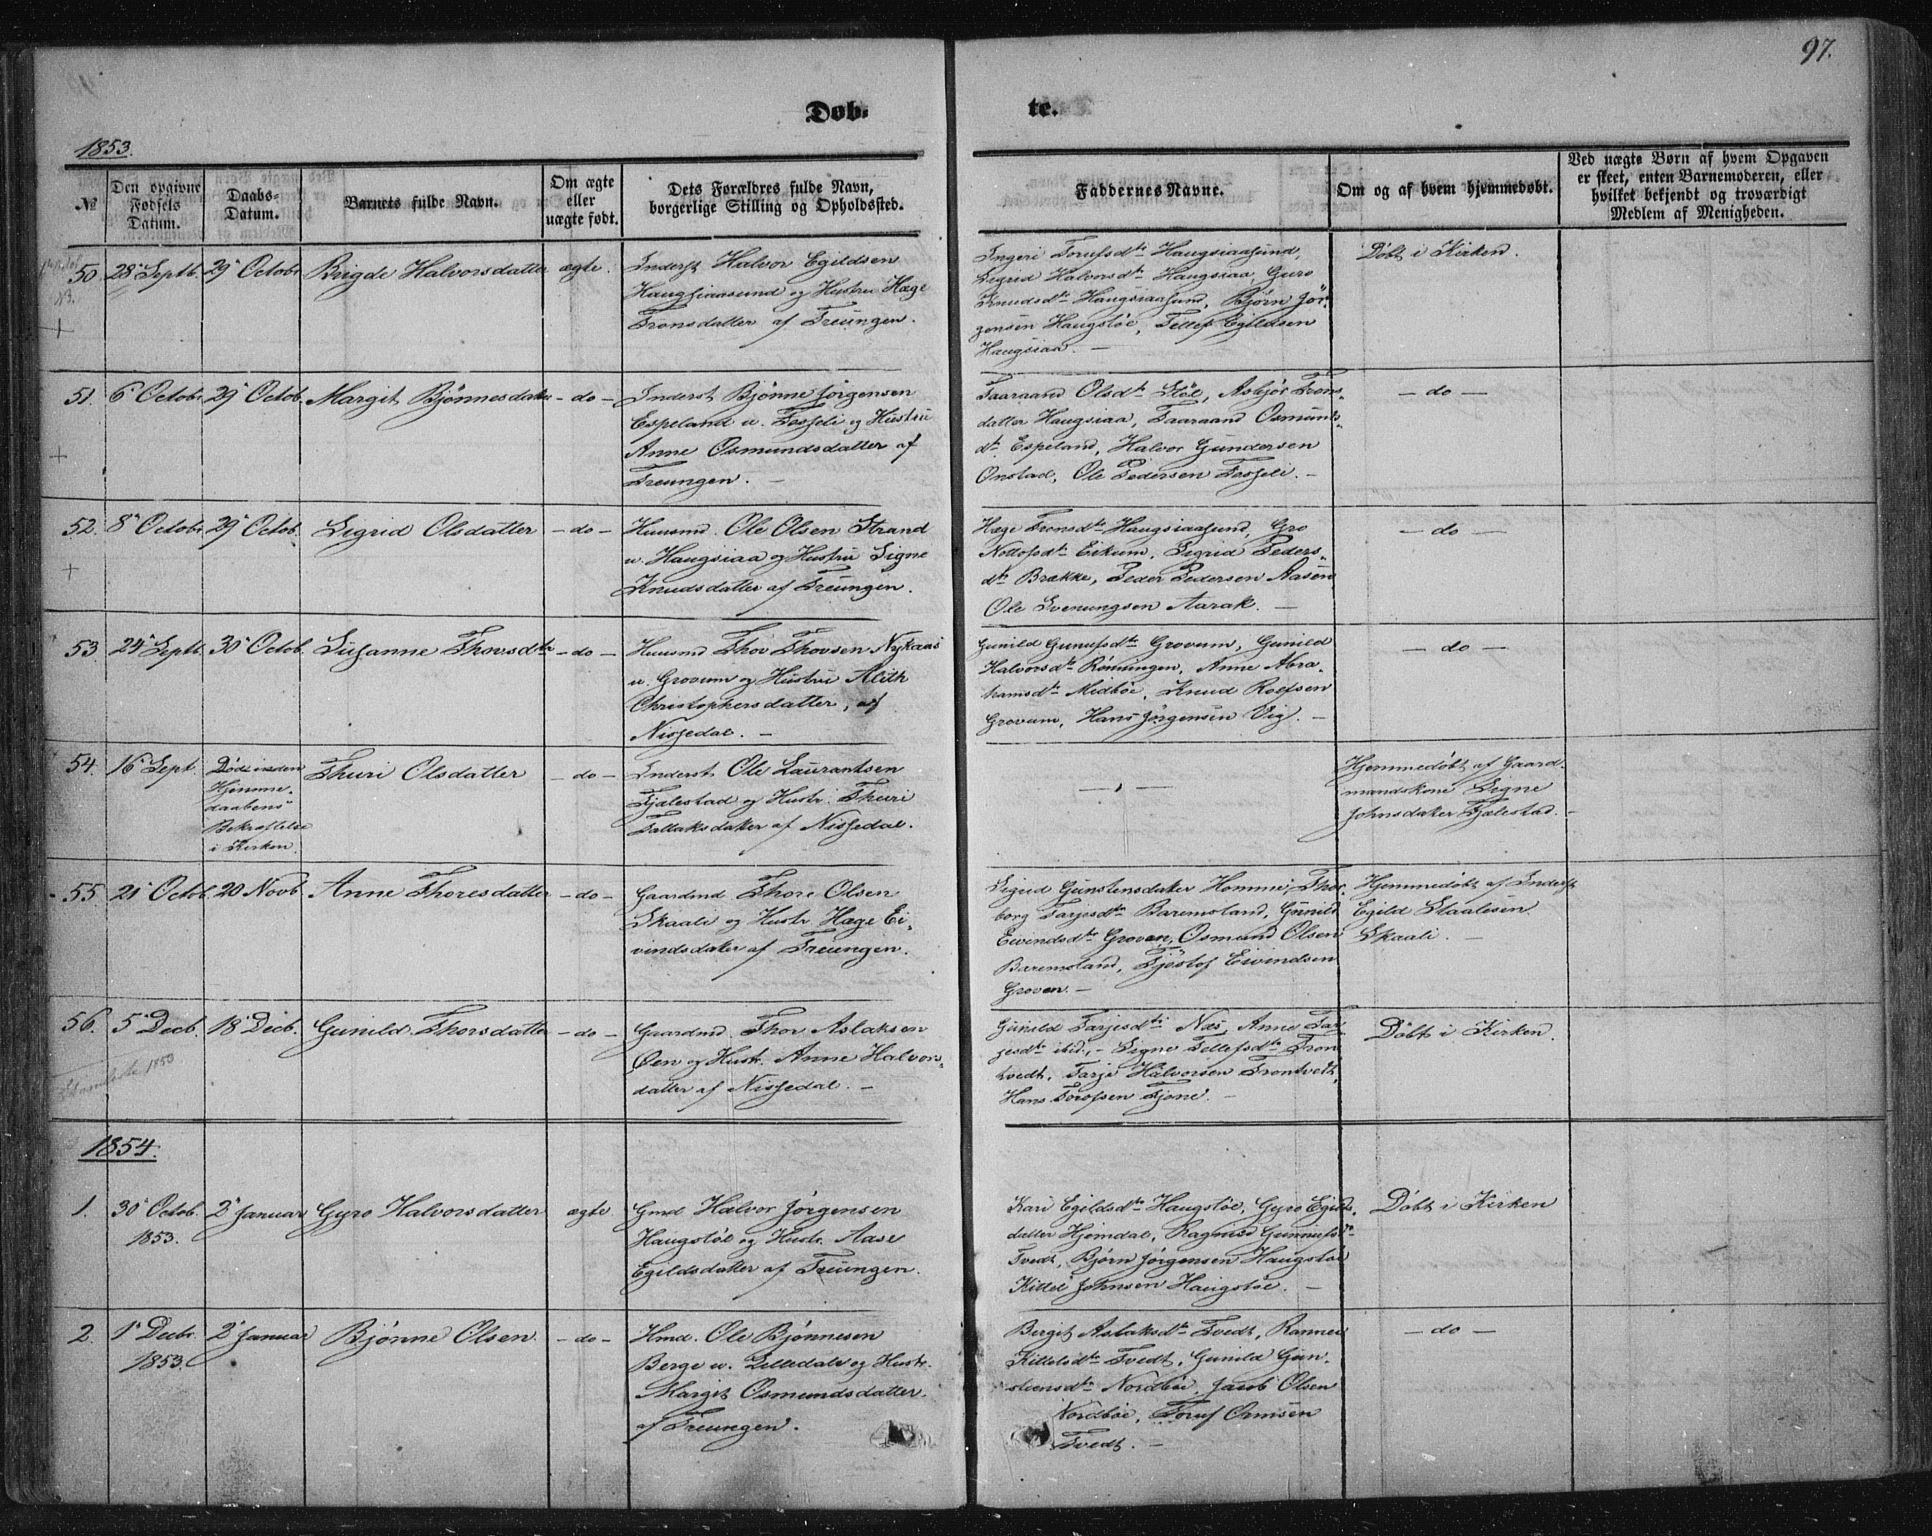 SAKO, Nissedal kirkebøker, F/Fa/L0003: Ministerialbok nr. I 3, 1846-1870, s. 96-97